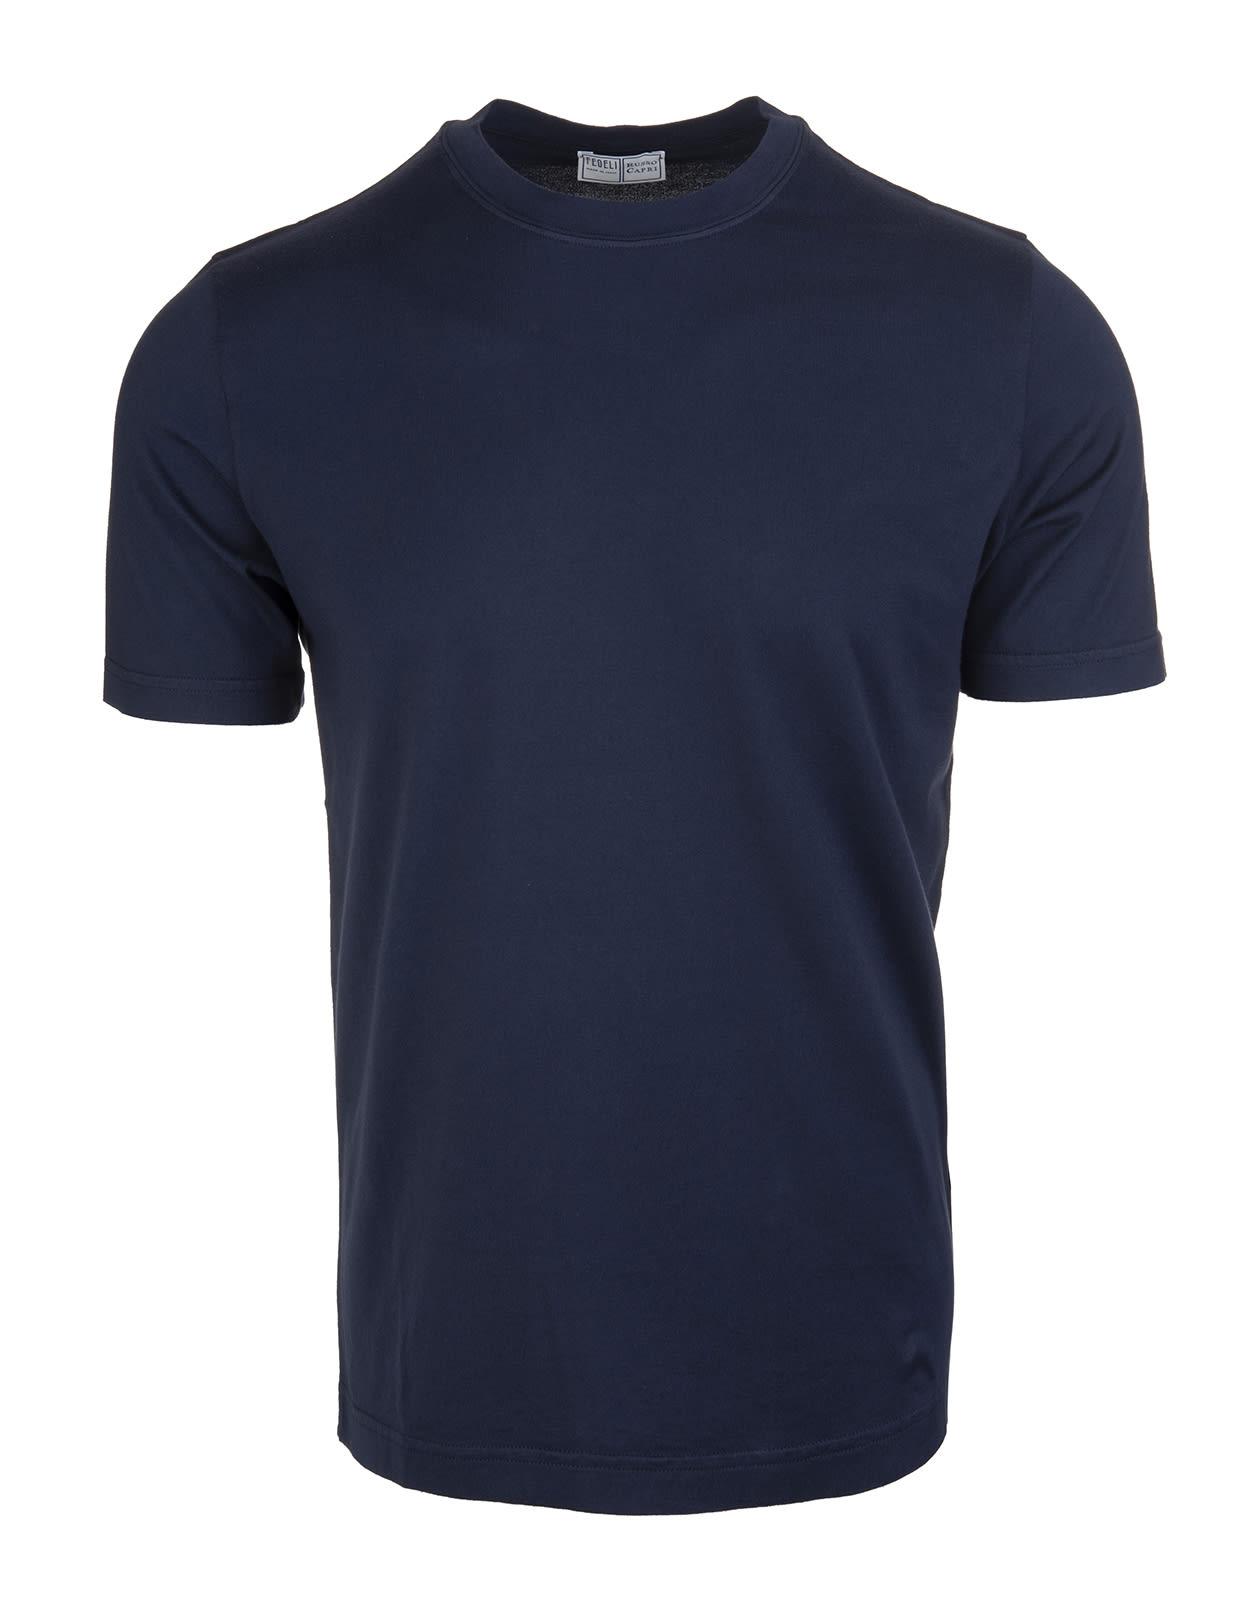 Fedeli Navy Blue Man T-shirt